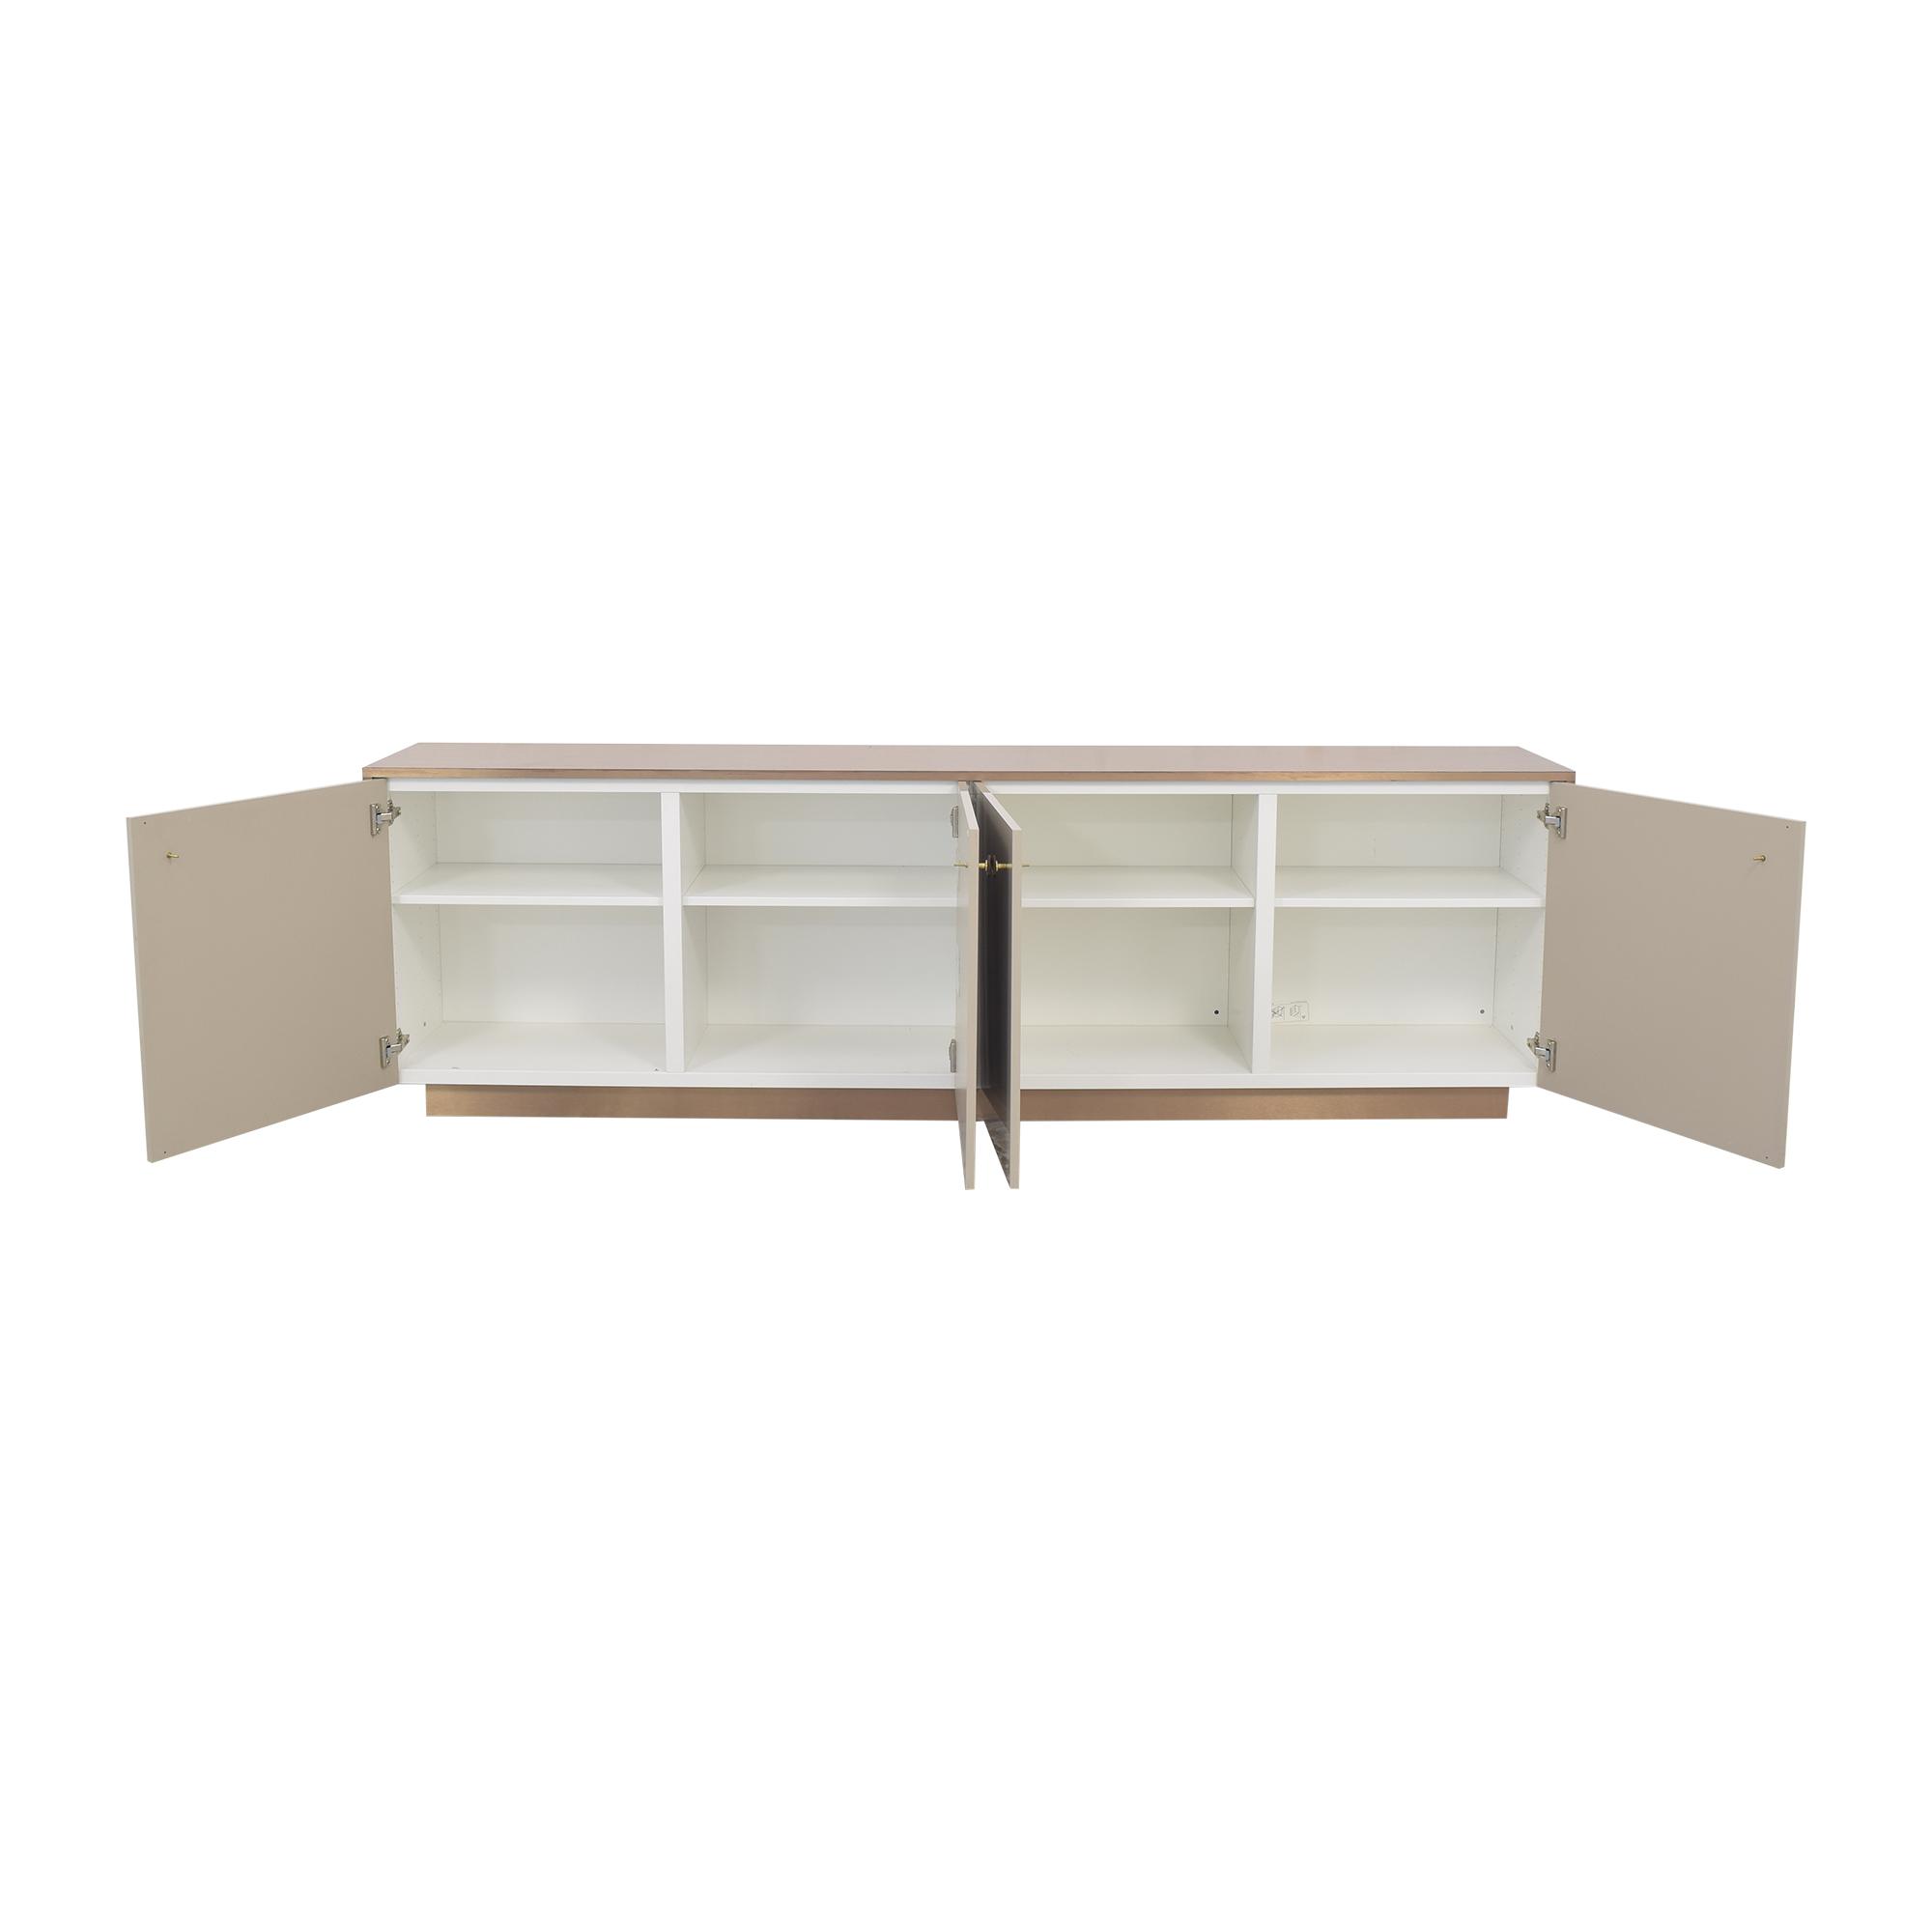 IKEA Media Console / Storage